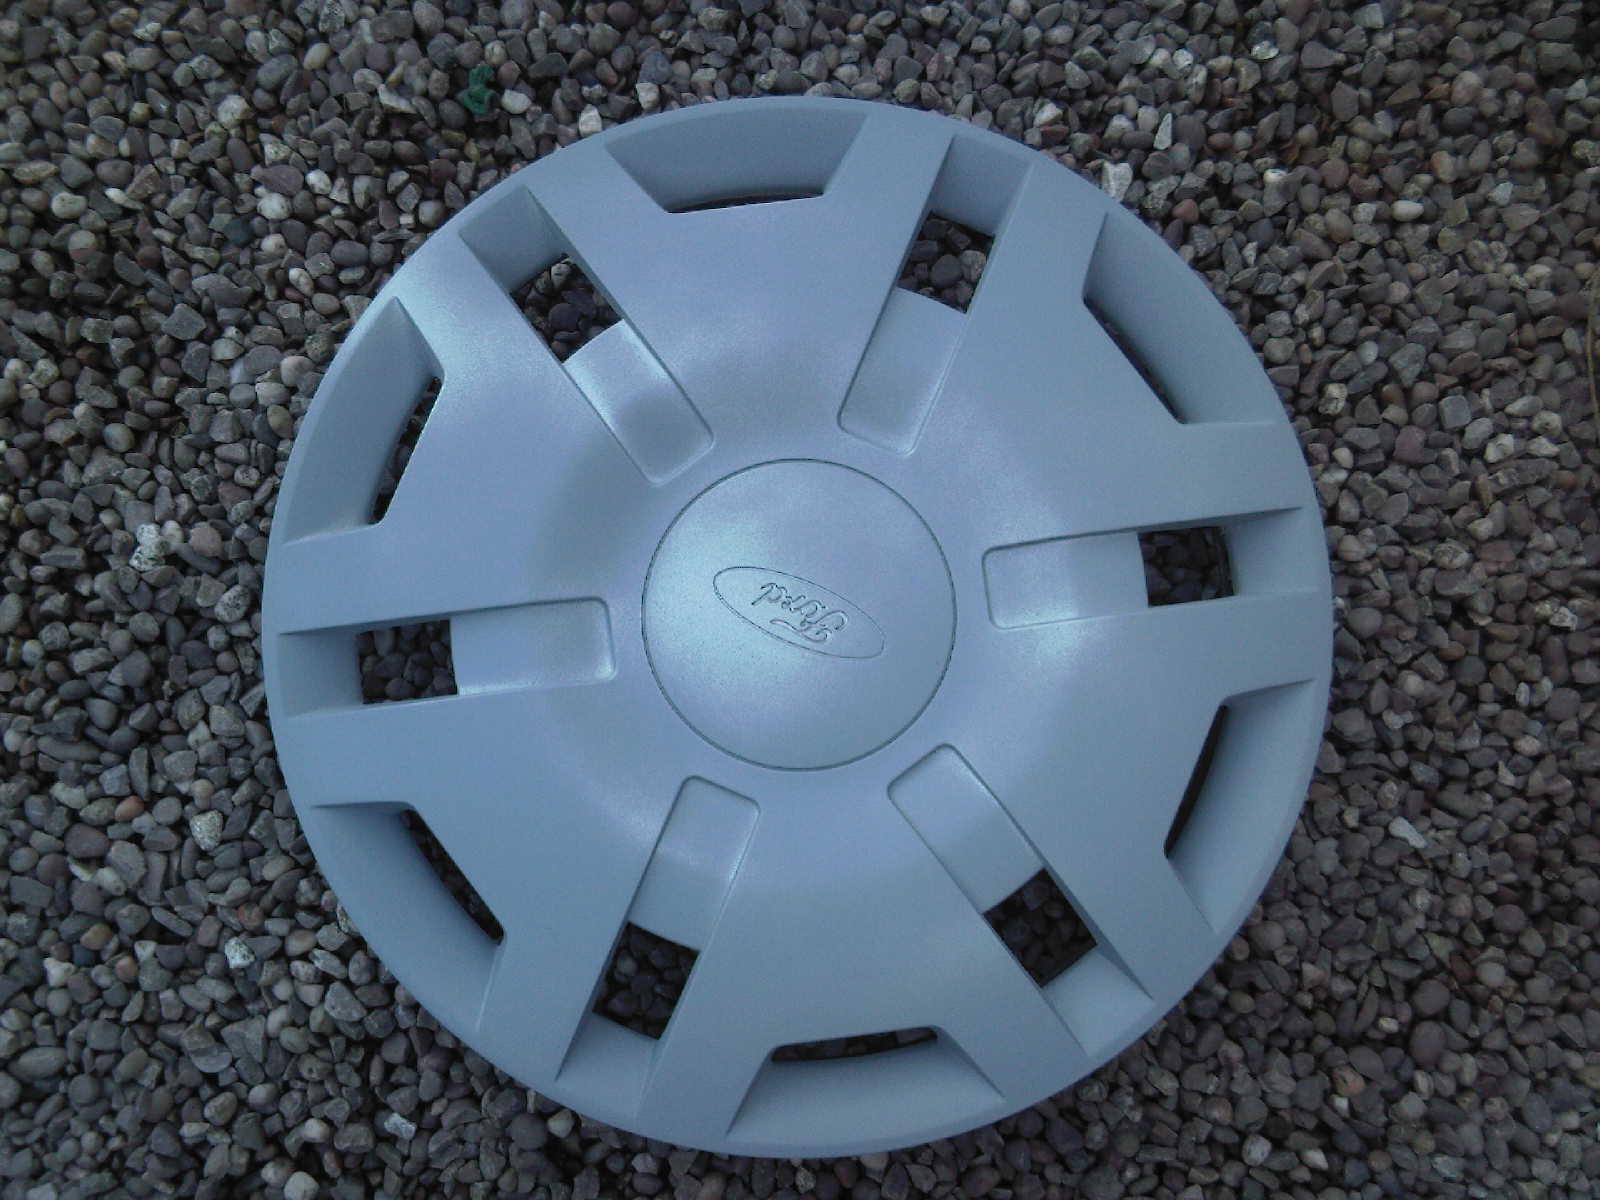 Fiesta Wheel Trim